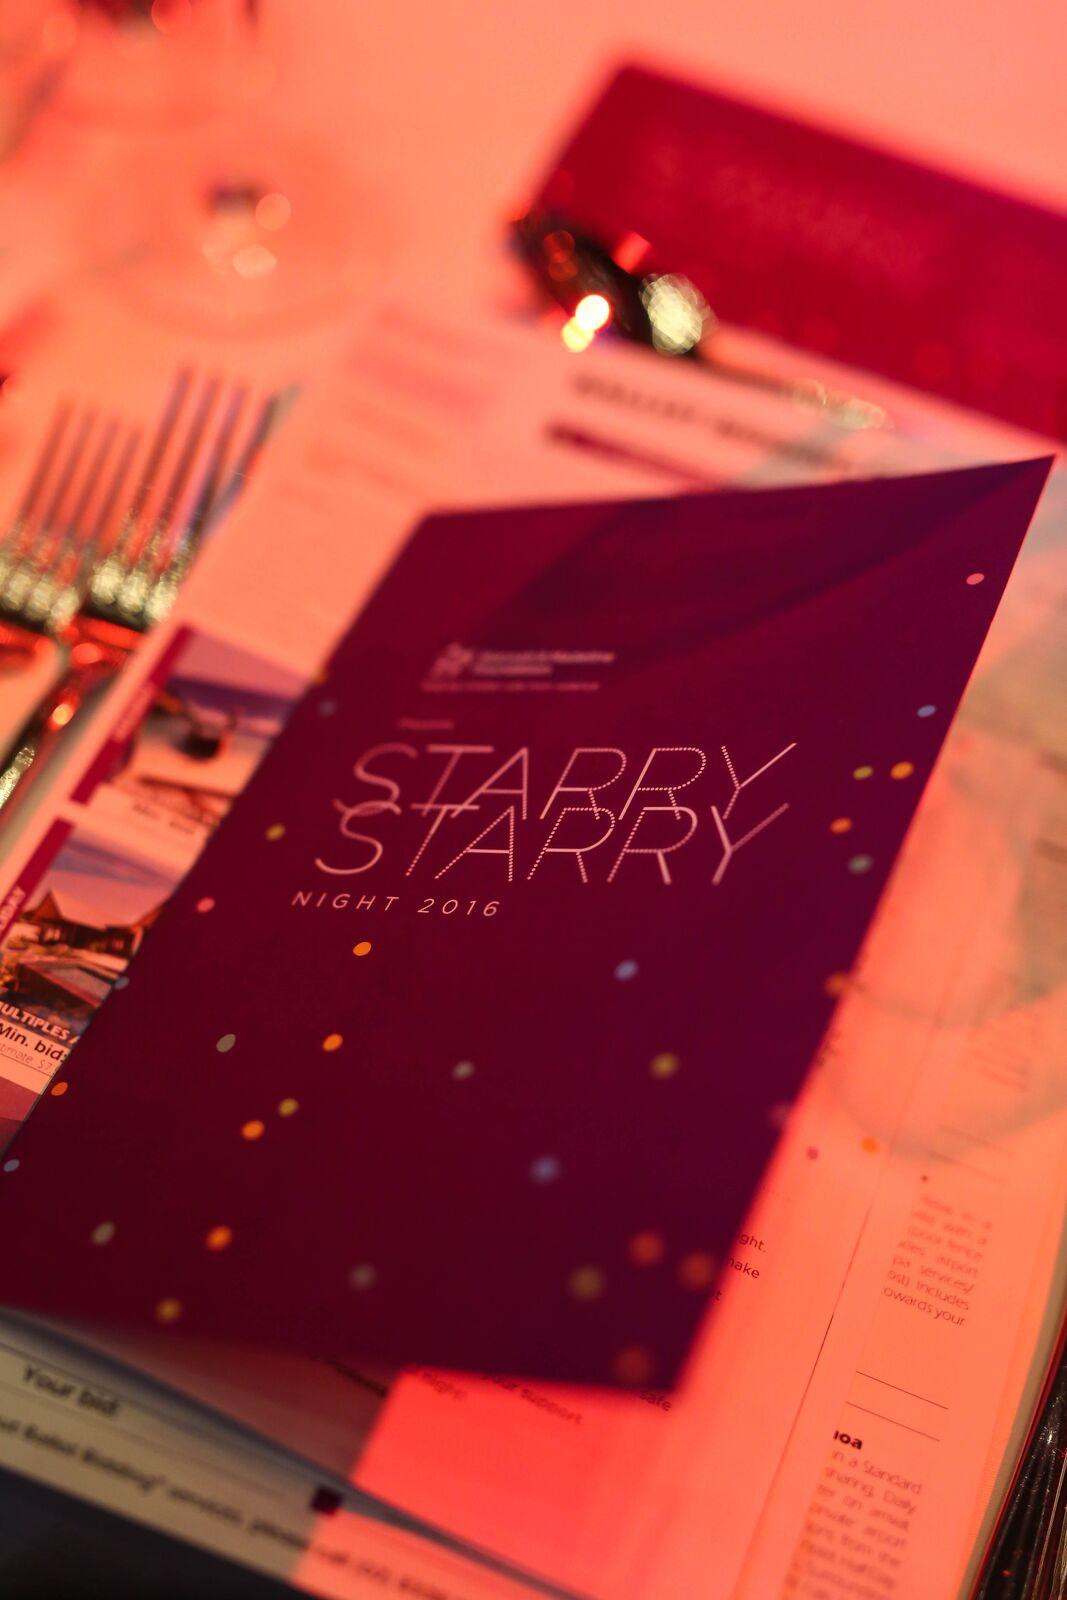 starry-starry-night-2016-program.jpg